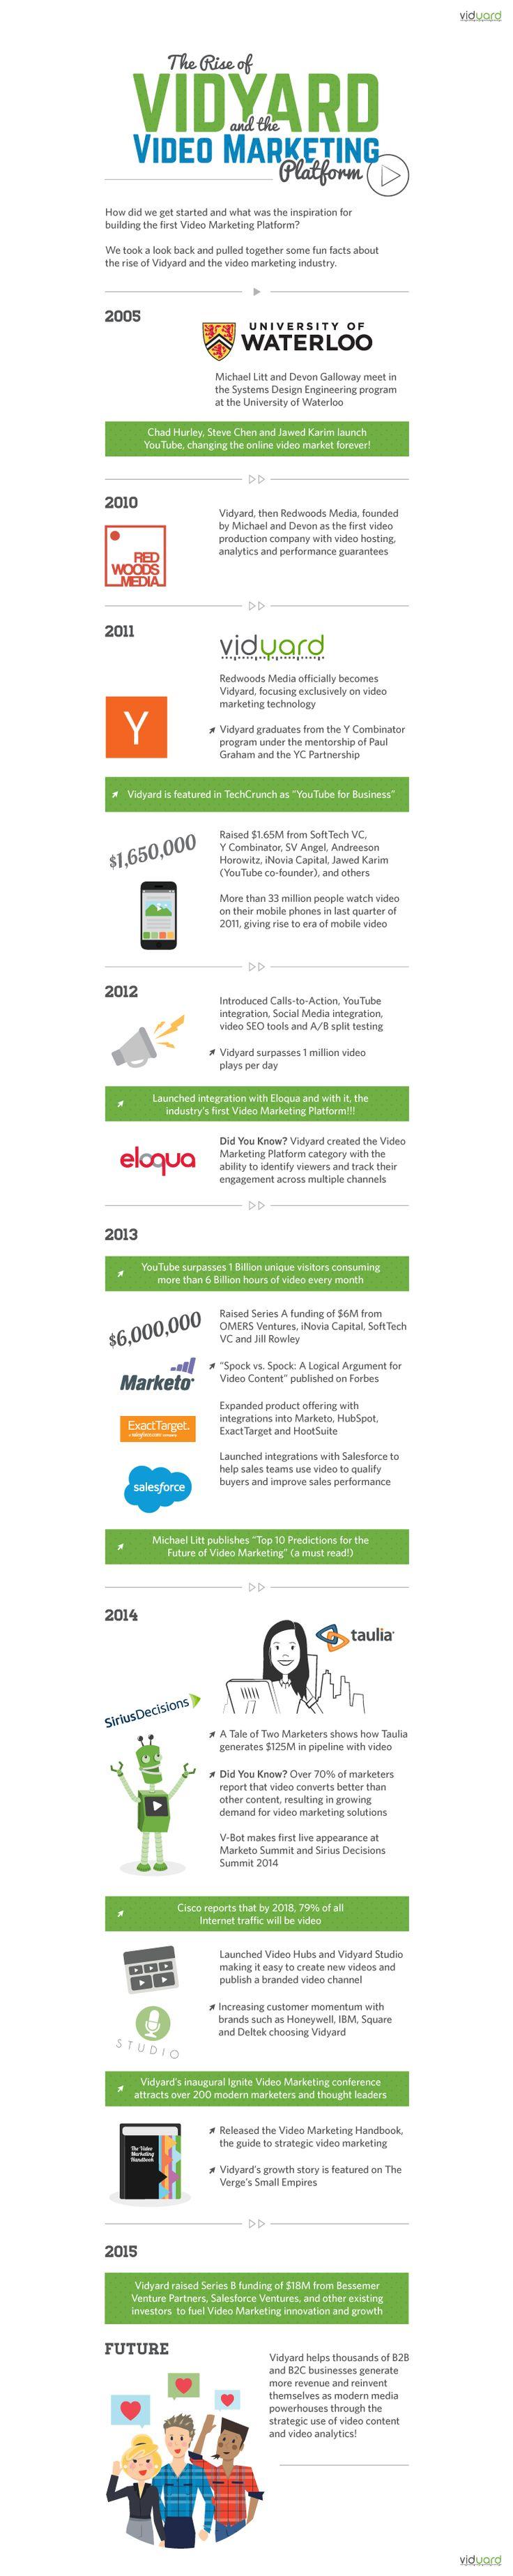 Vidyard Timeline The Rise of Vidyard and the Video Marketing Platform